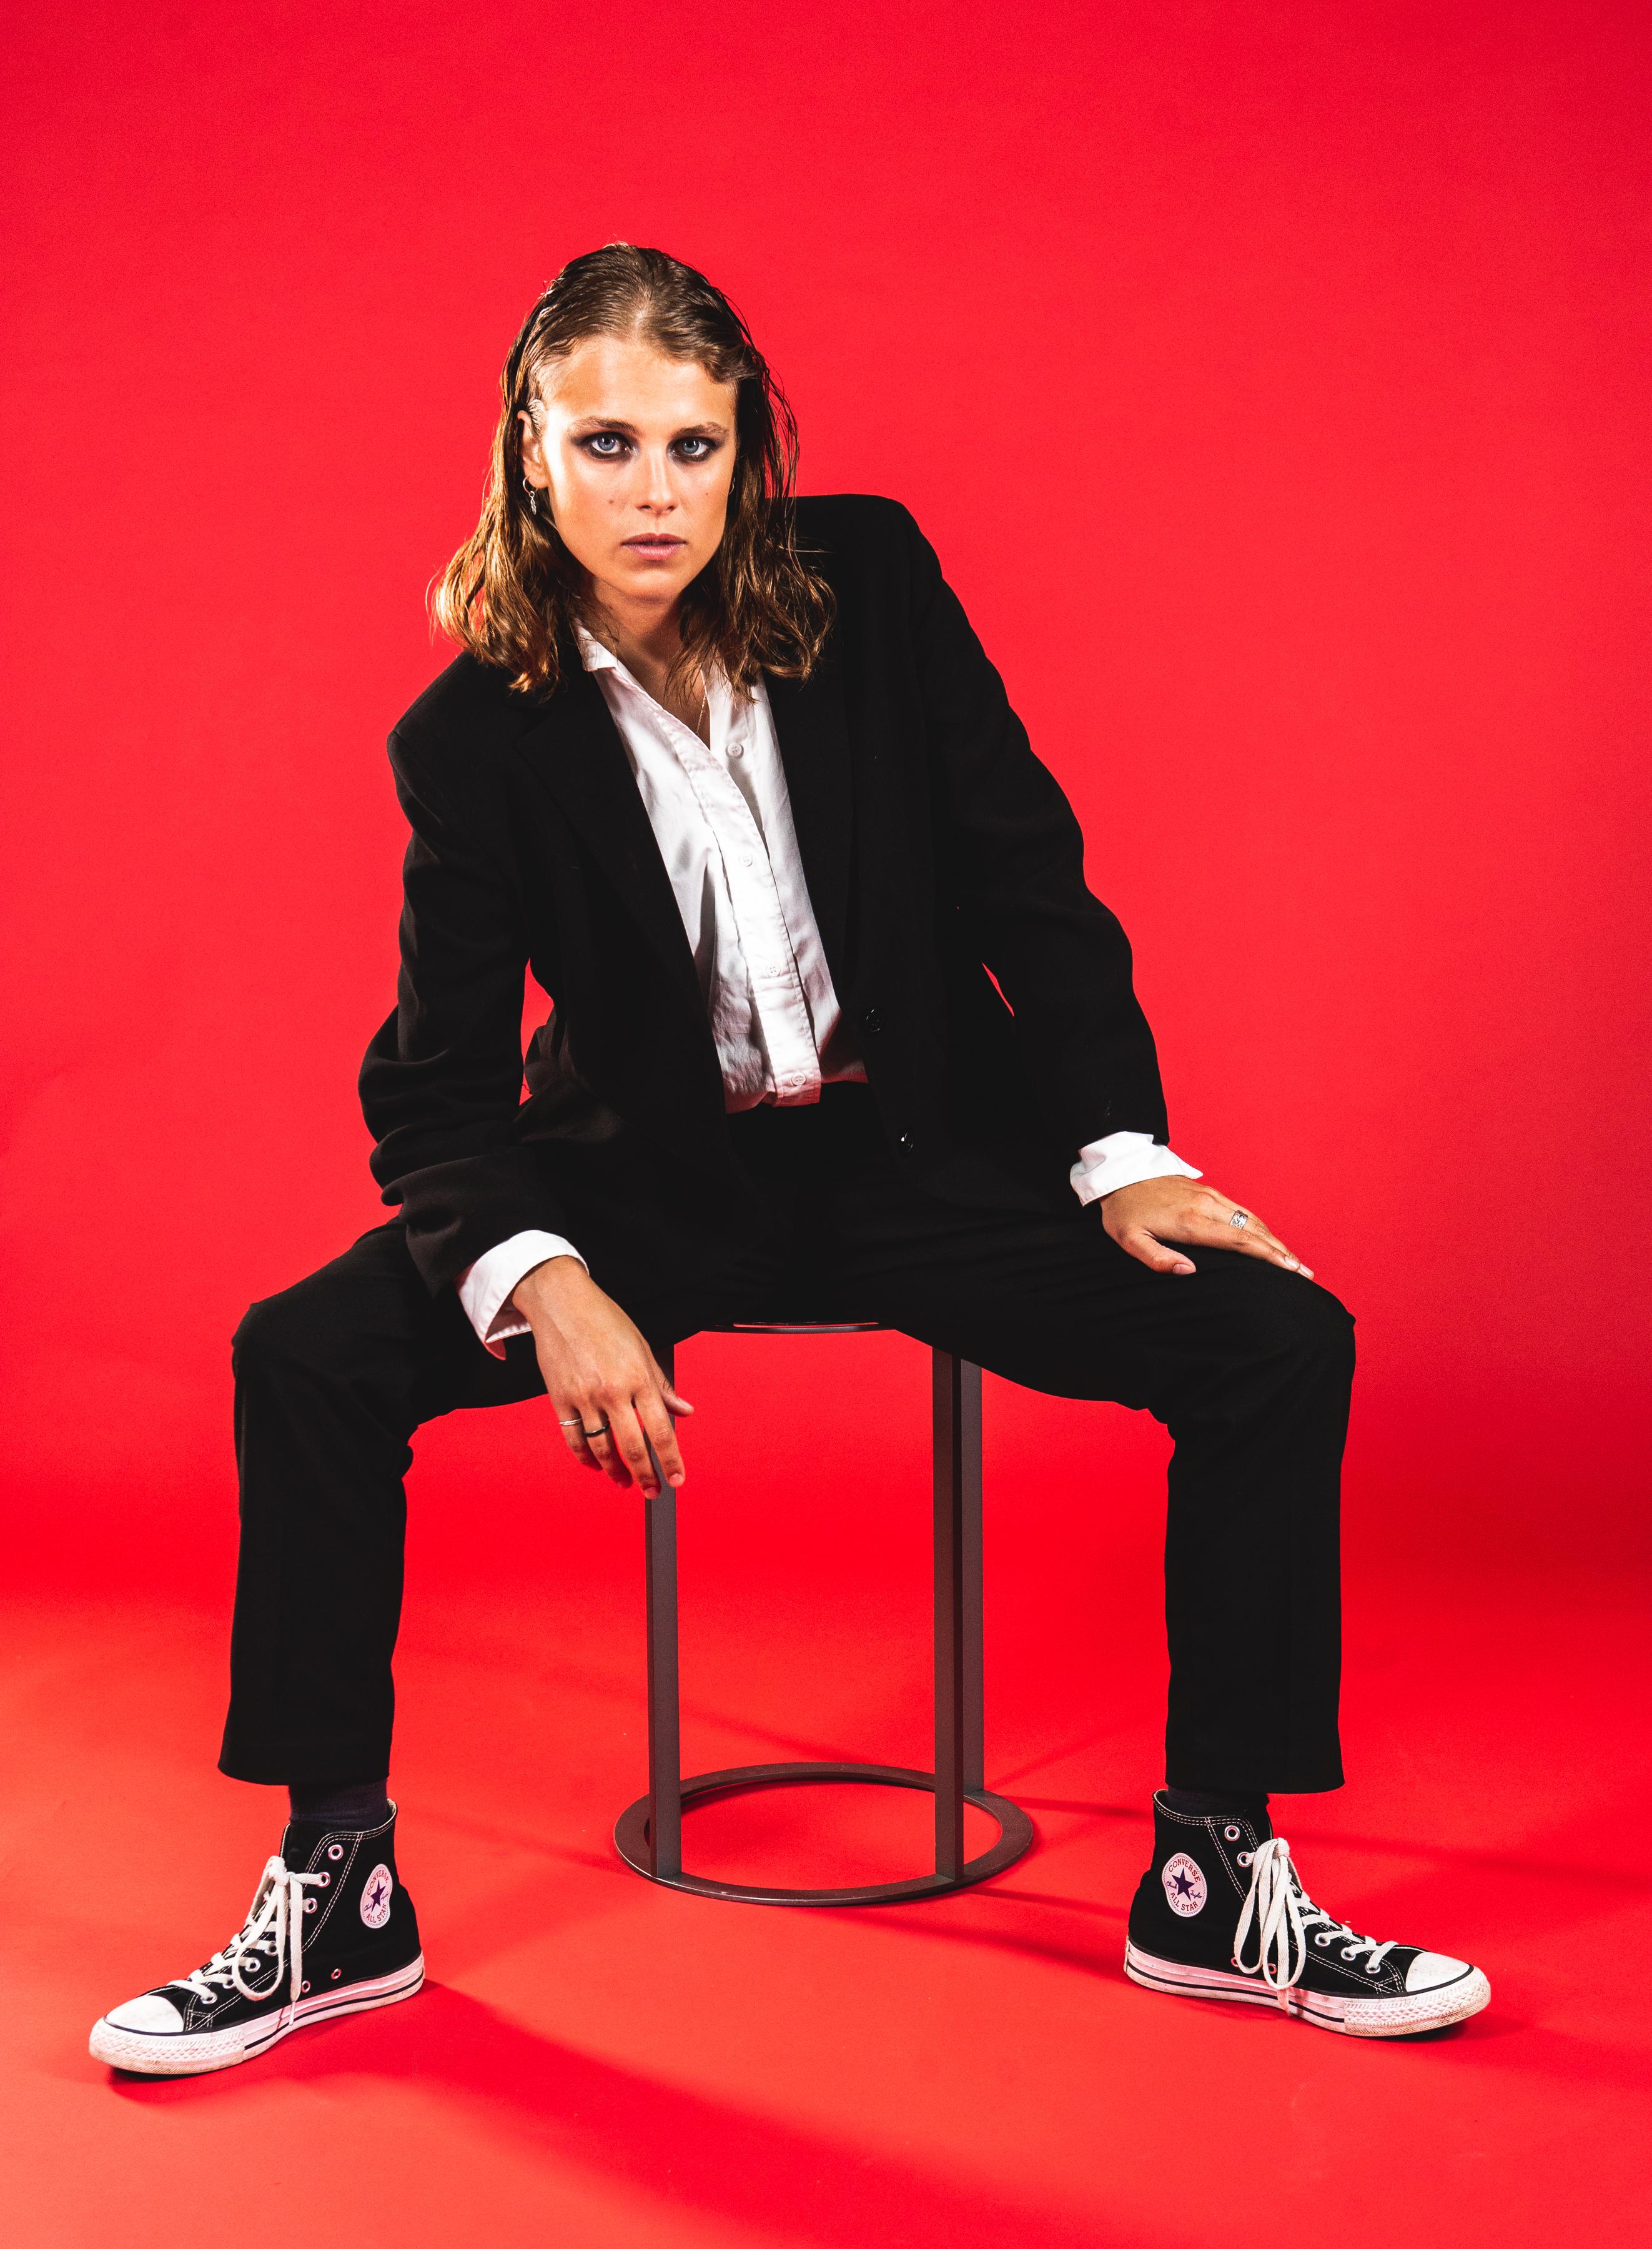 Marika Hackman NME interview